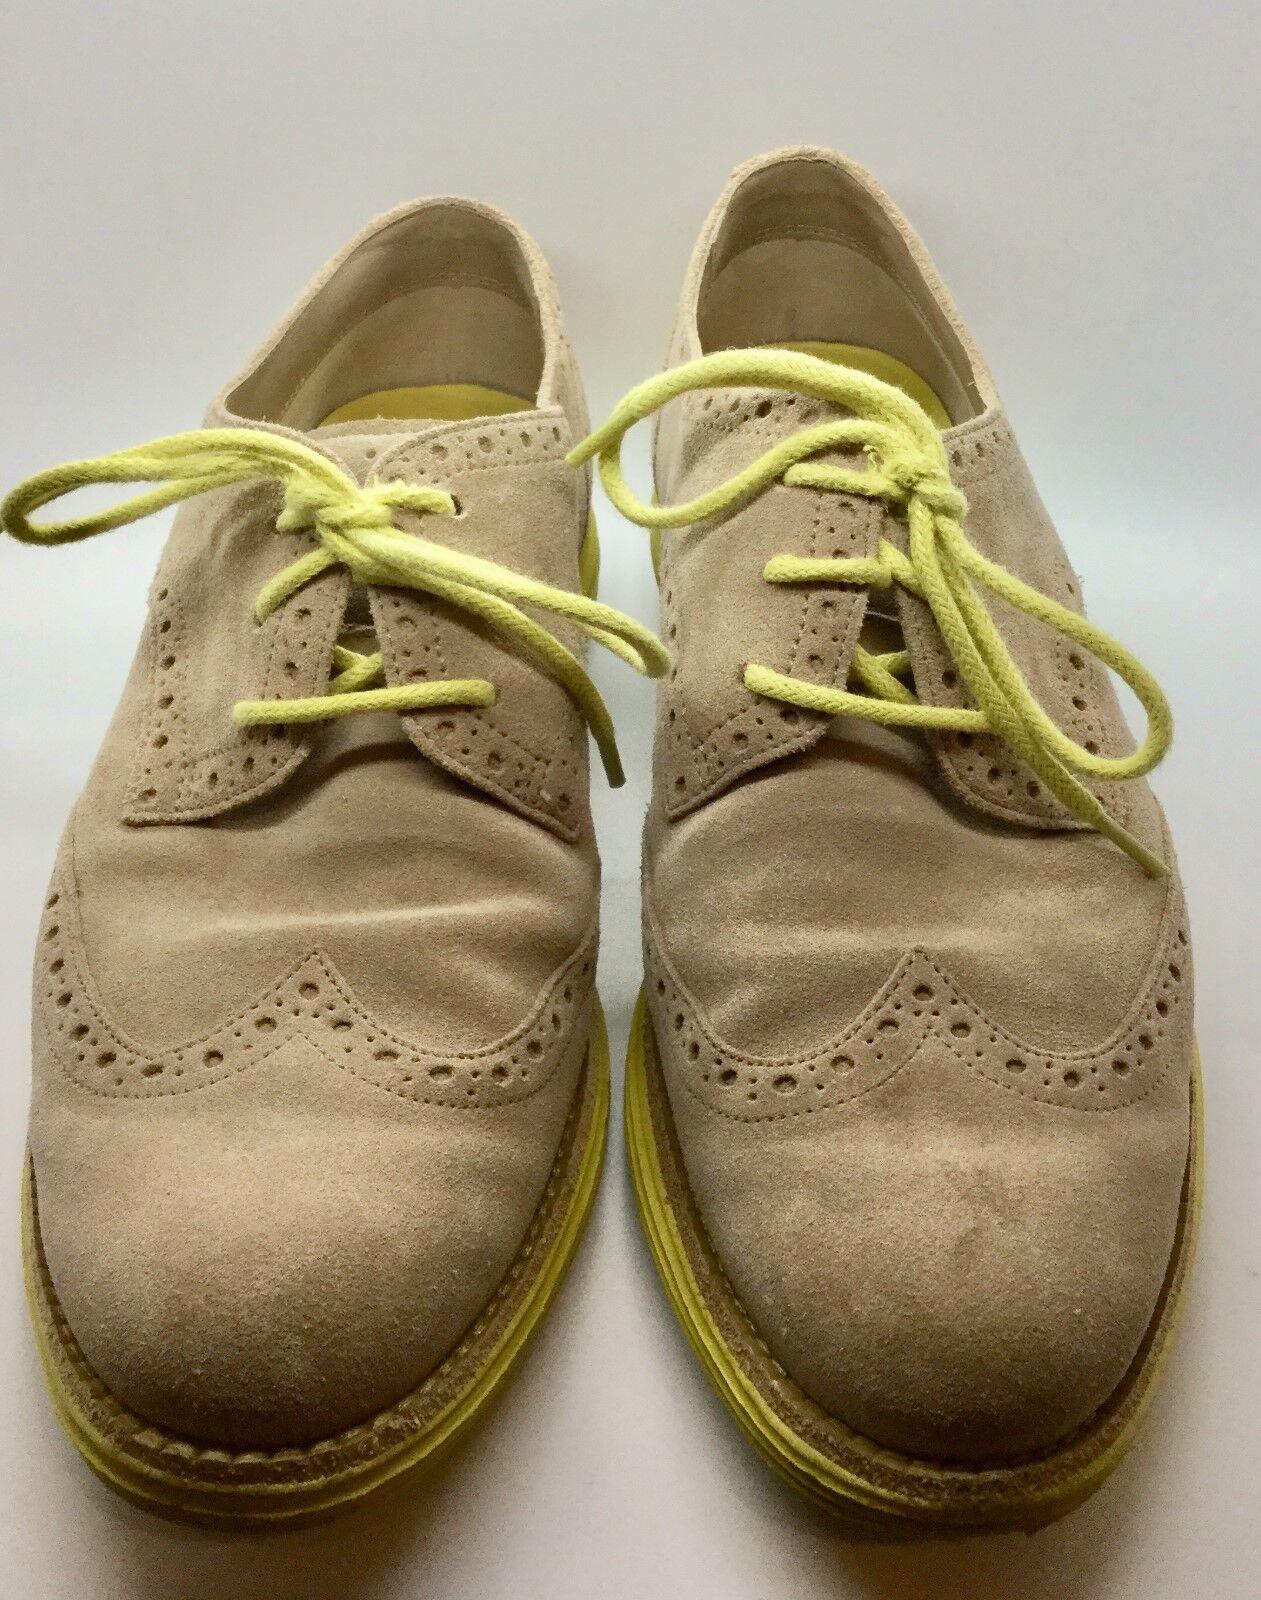 Cole Cole Cole haan lunargrand De Gamuza Marrón Amarillo Tamaño 8 Zapatos chatos Oxford Con Cordones  de moda